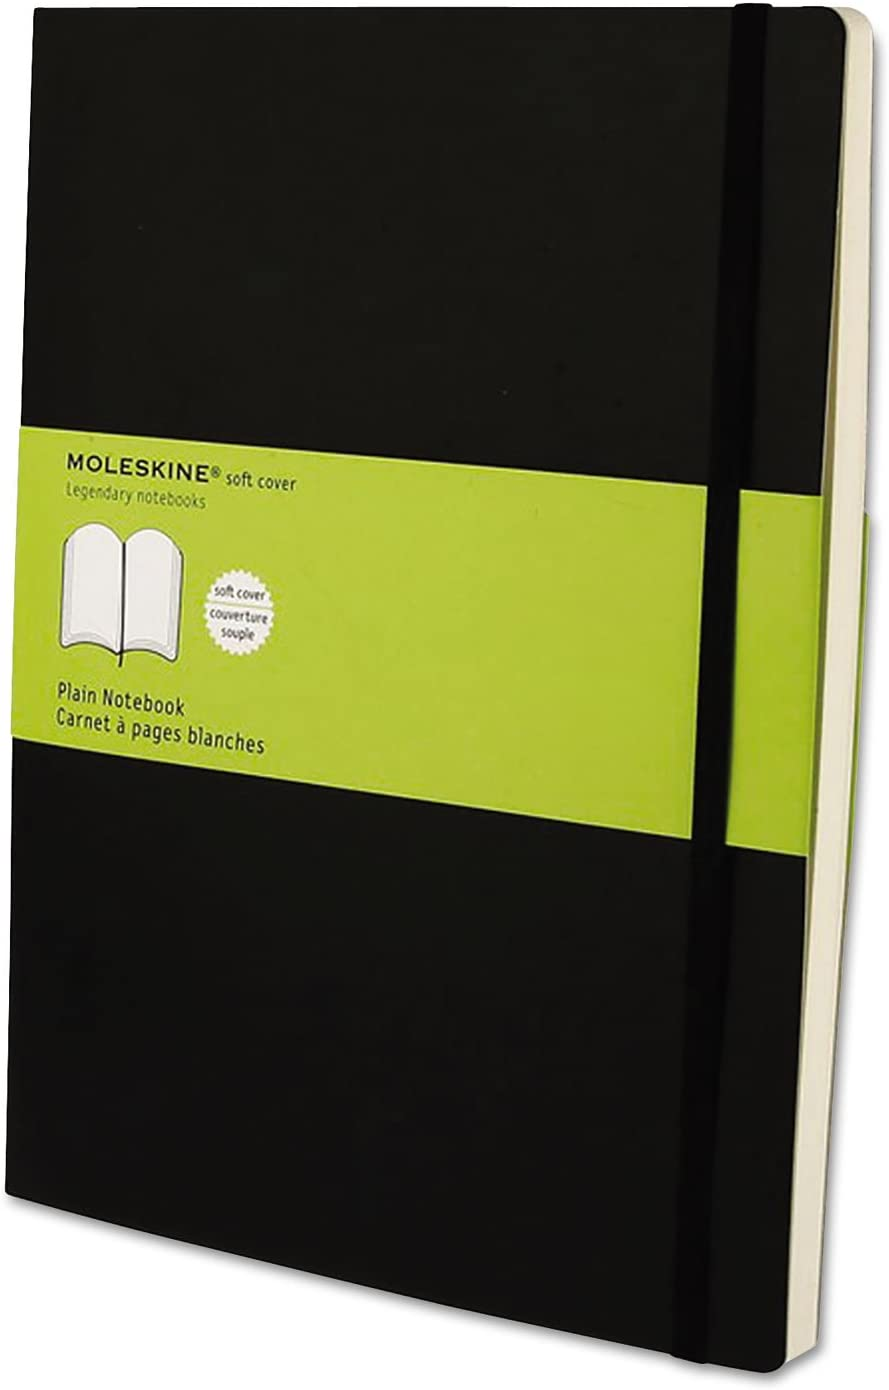 NEW Moleskine MSX17 Classic Softcover Notebook Plain 10 x 1 7 2 Jacksonville Mall Blac